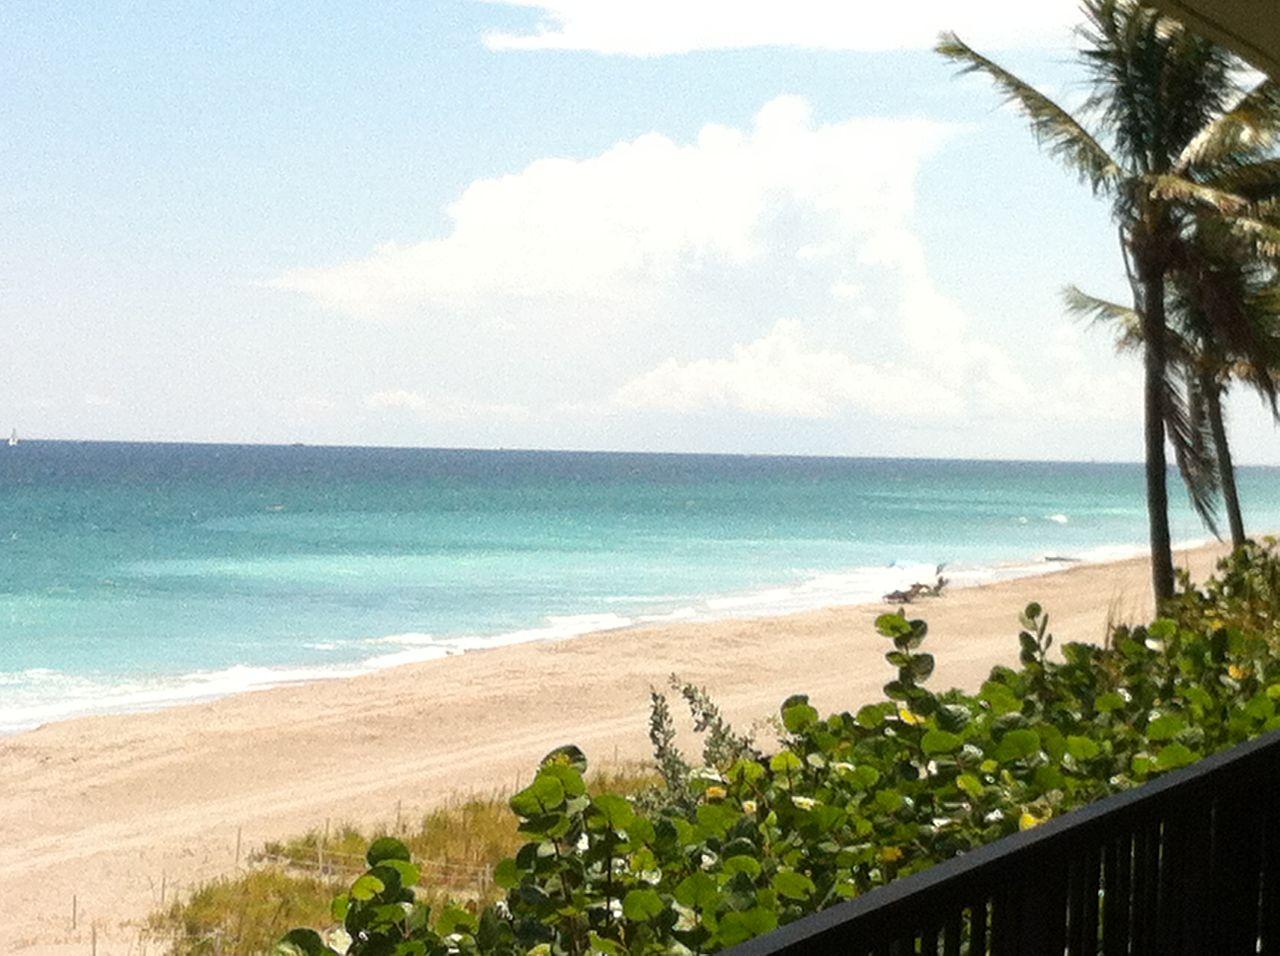 Hastighet dating Palm Beach FL